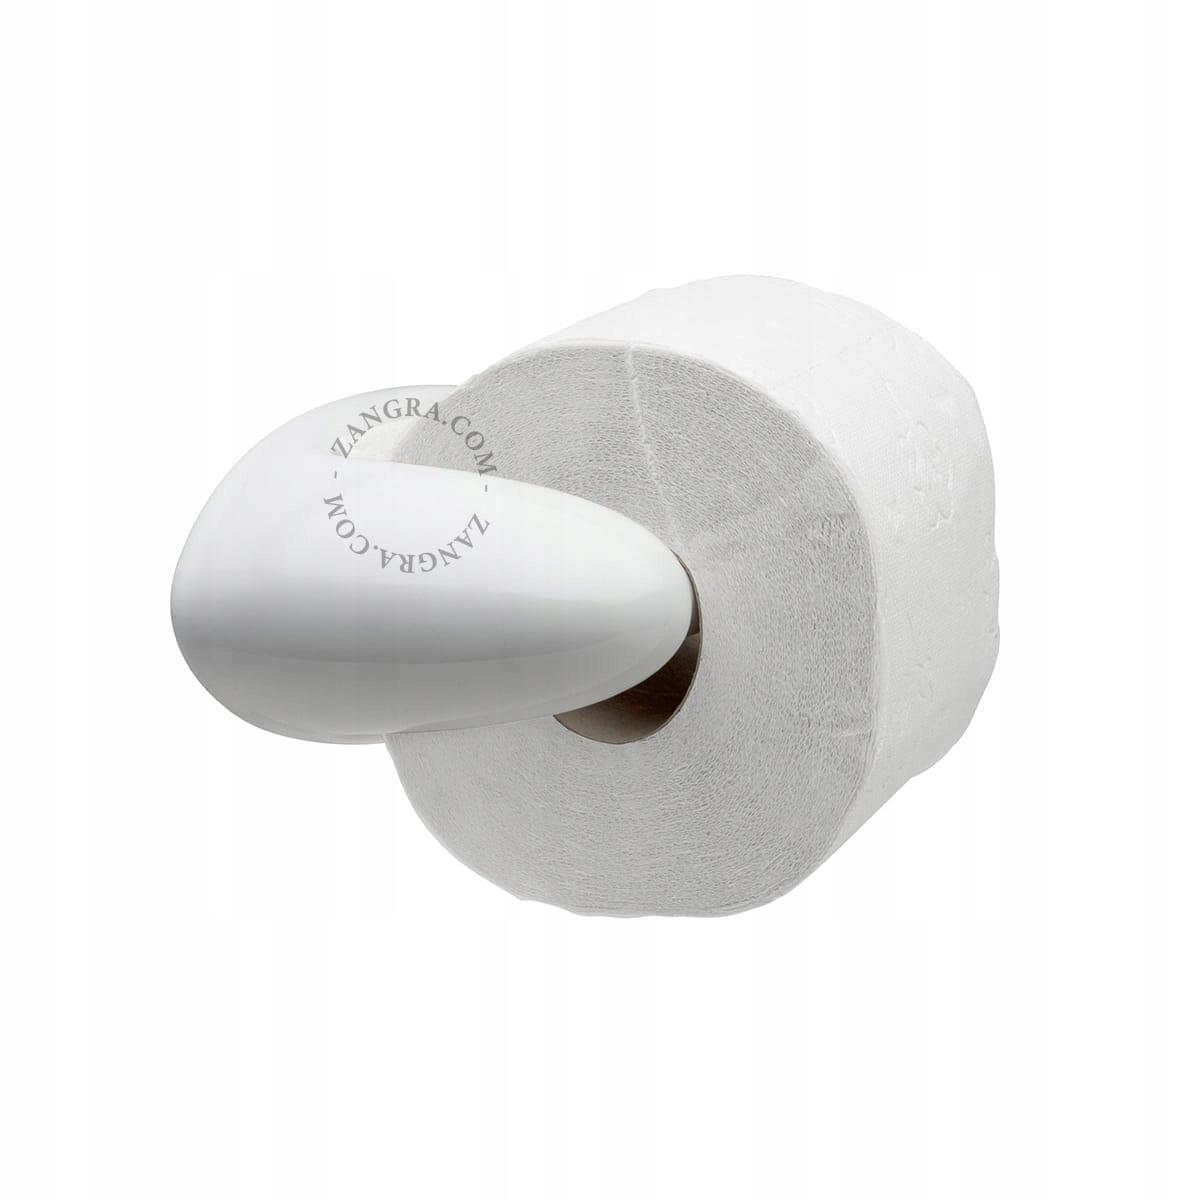 Držiak na papier 002 biely - Zangra